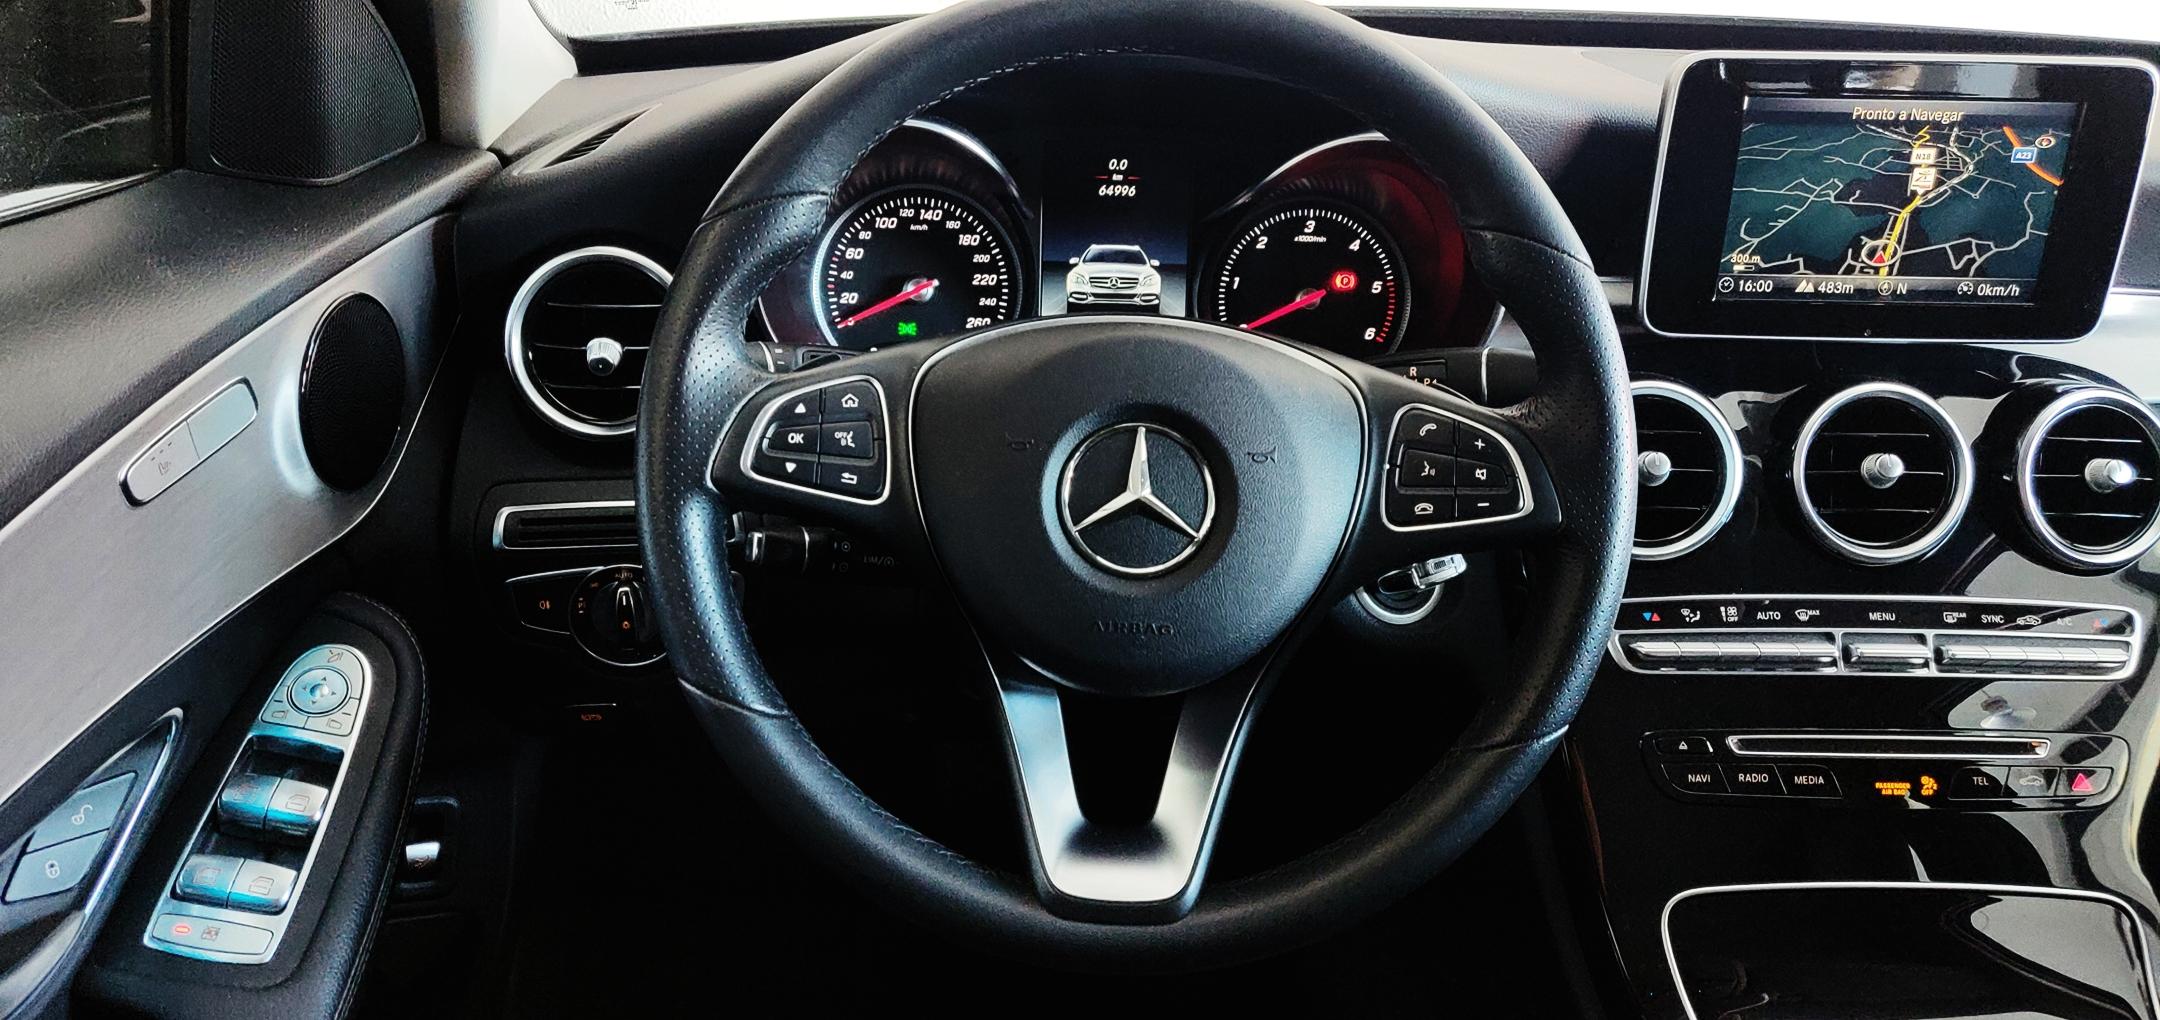 Mercedes-Benz C 220 Avantgarde | Imagem 10